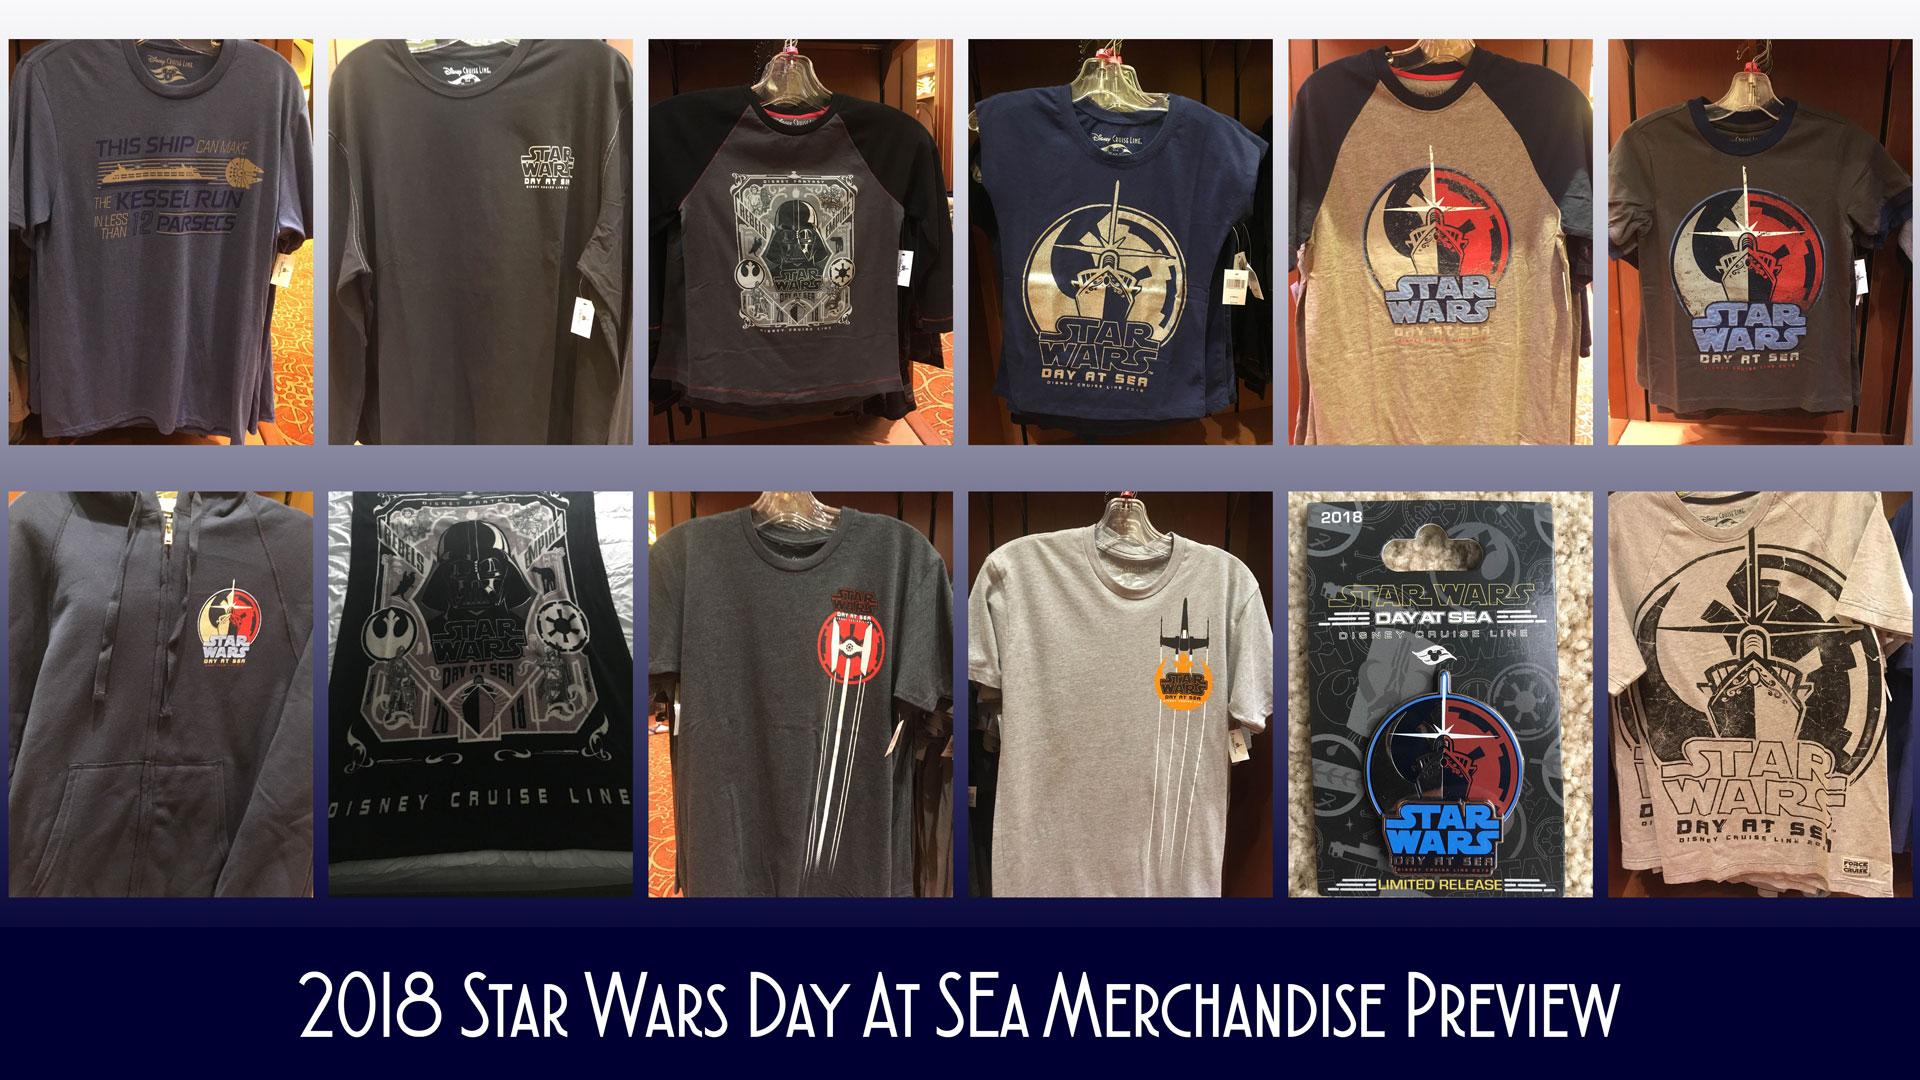 SWDAS 2018 Merchandise Preview